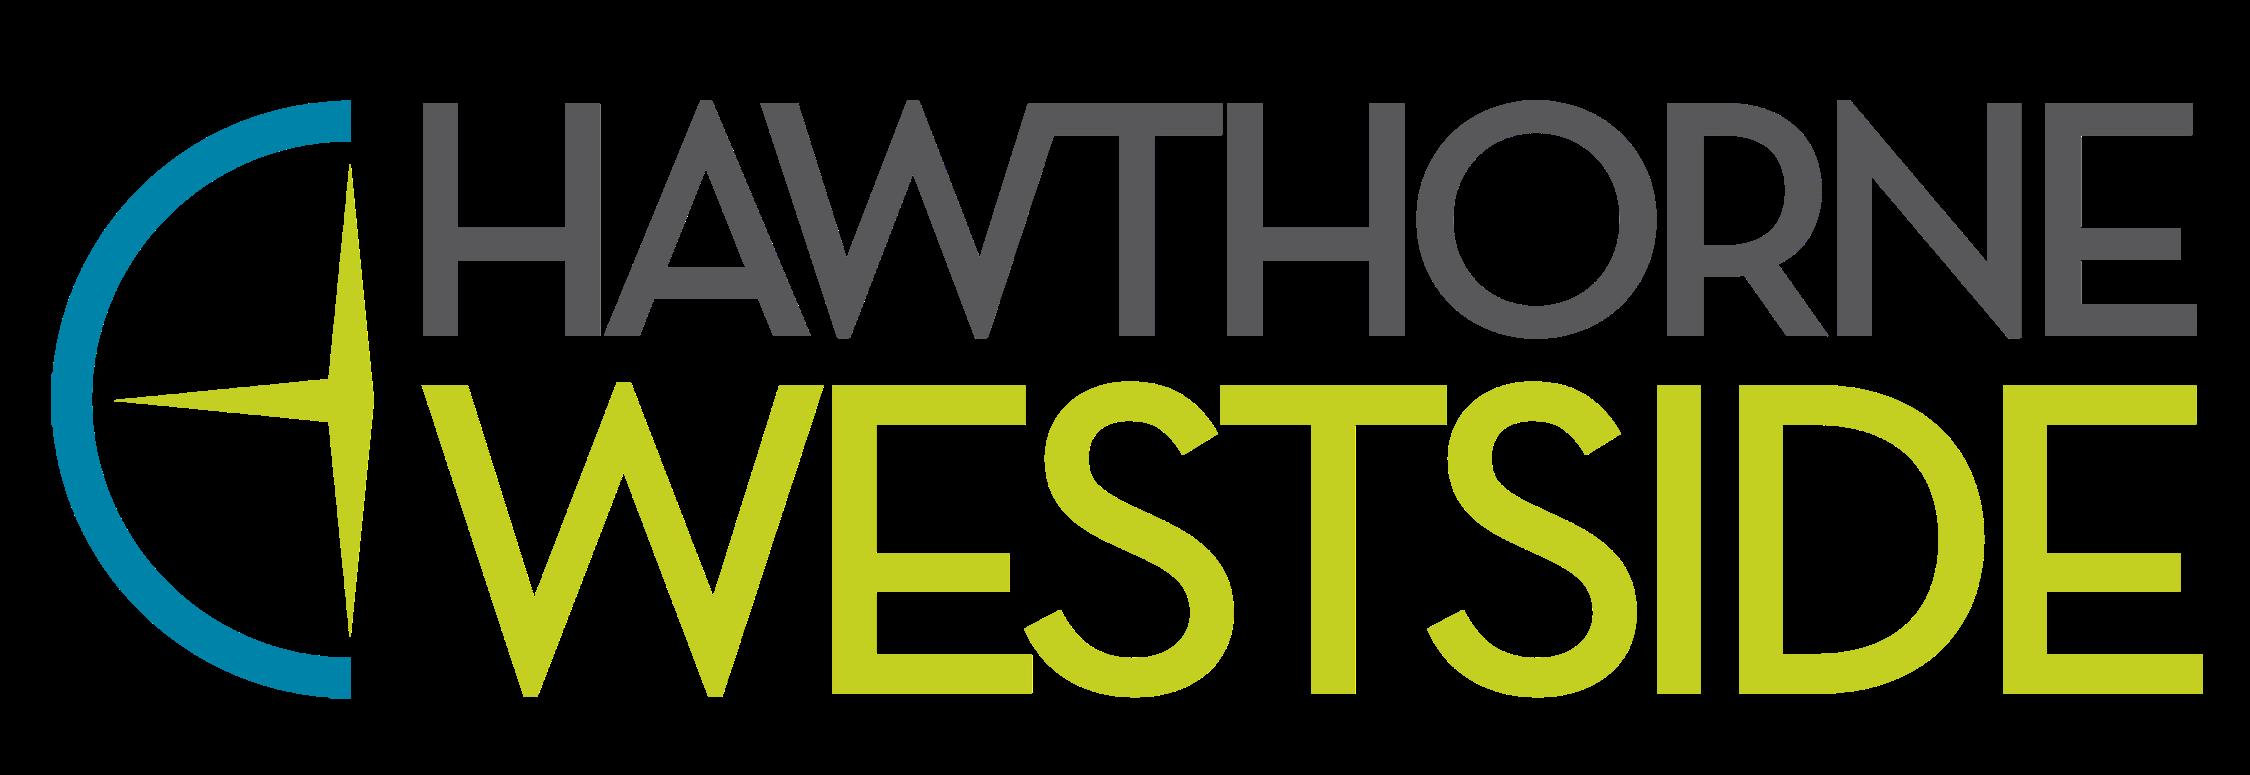 Hawthorne Westside Property Logo Charleston, SC